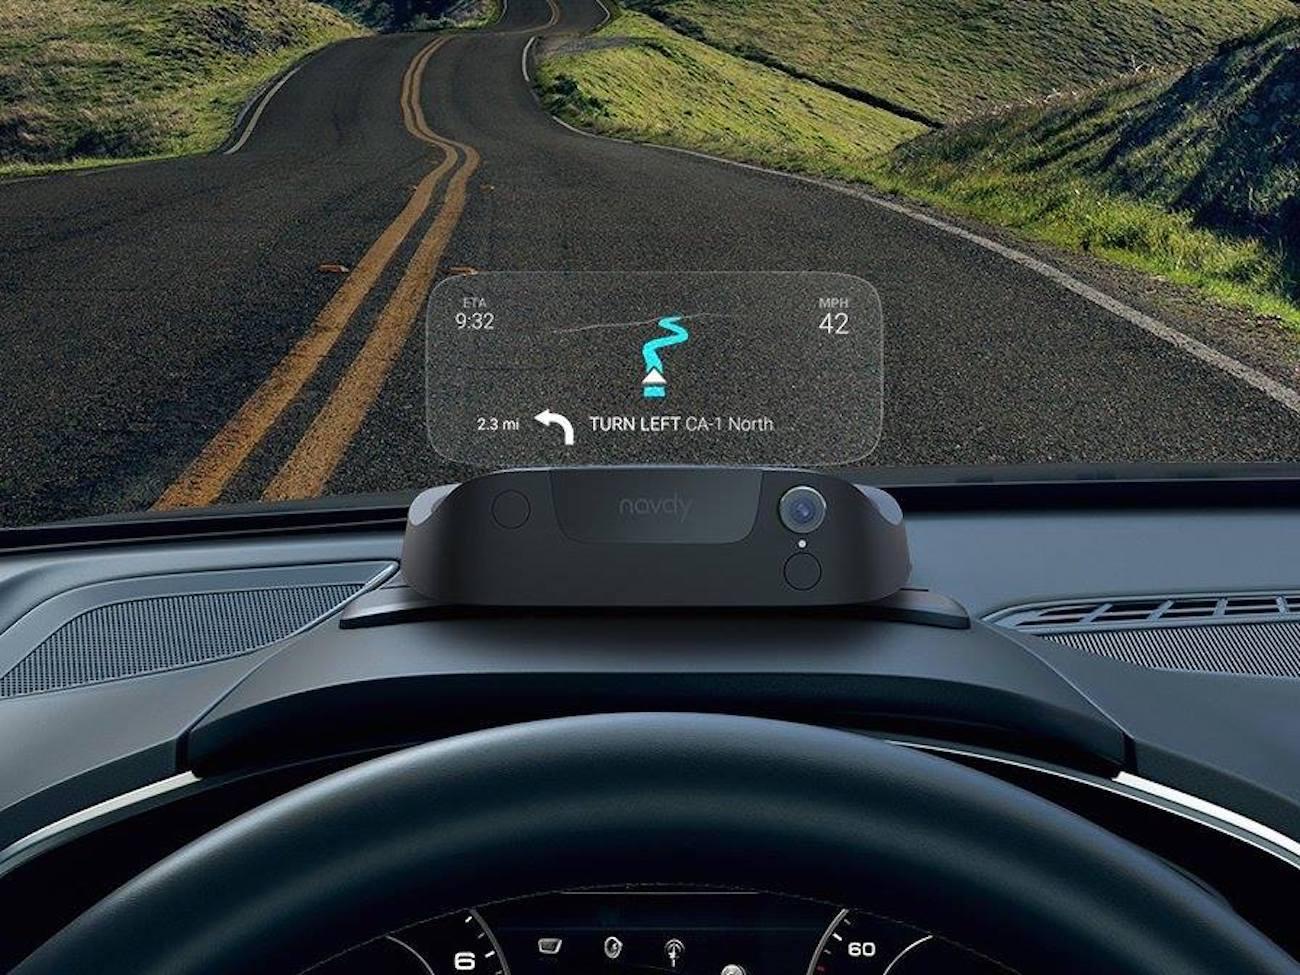 Navdy Portable Head-Up Display